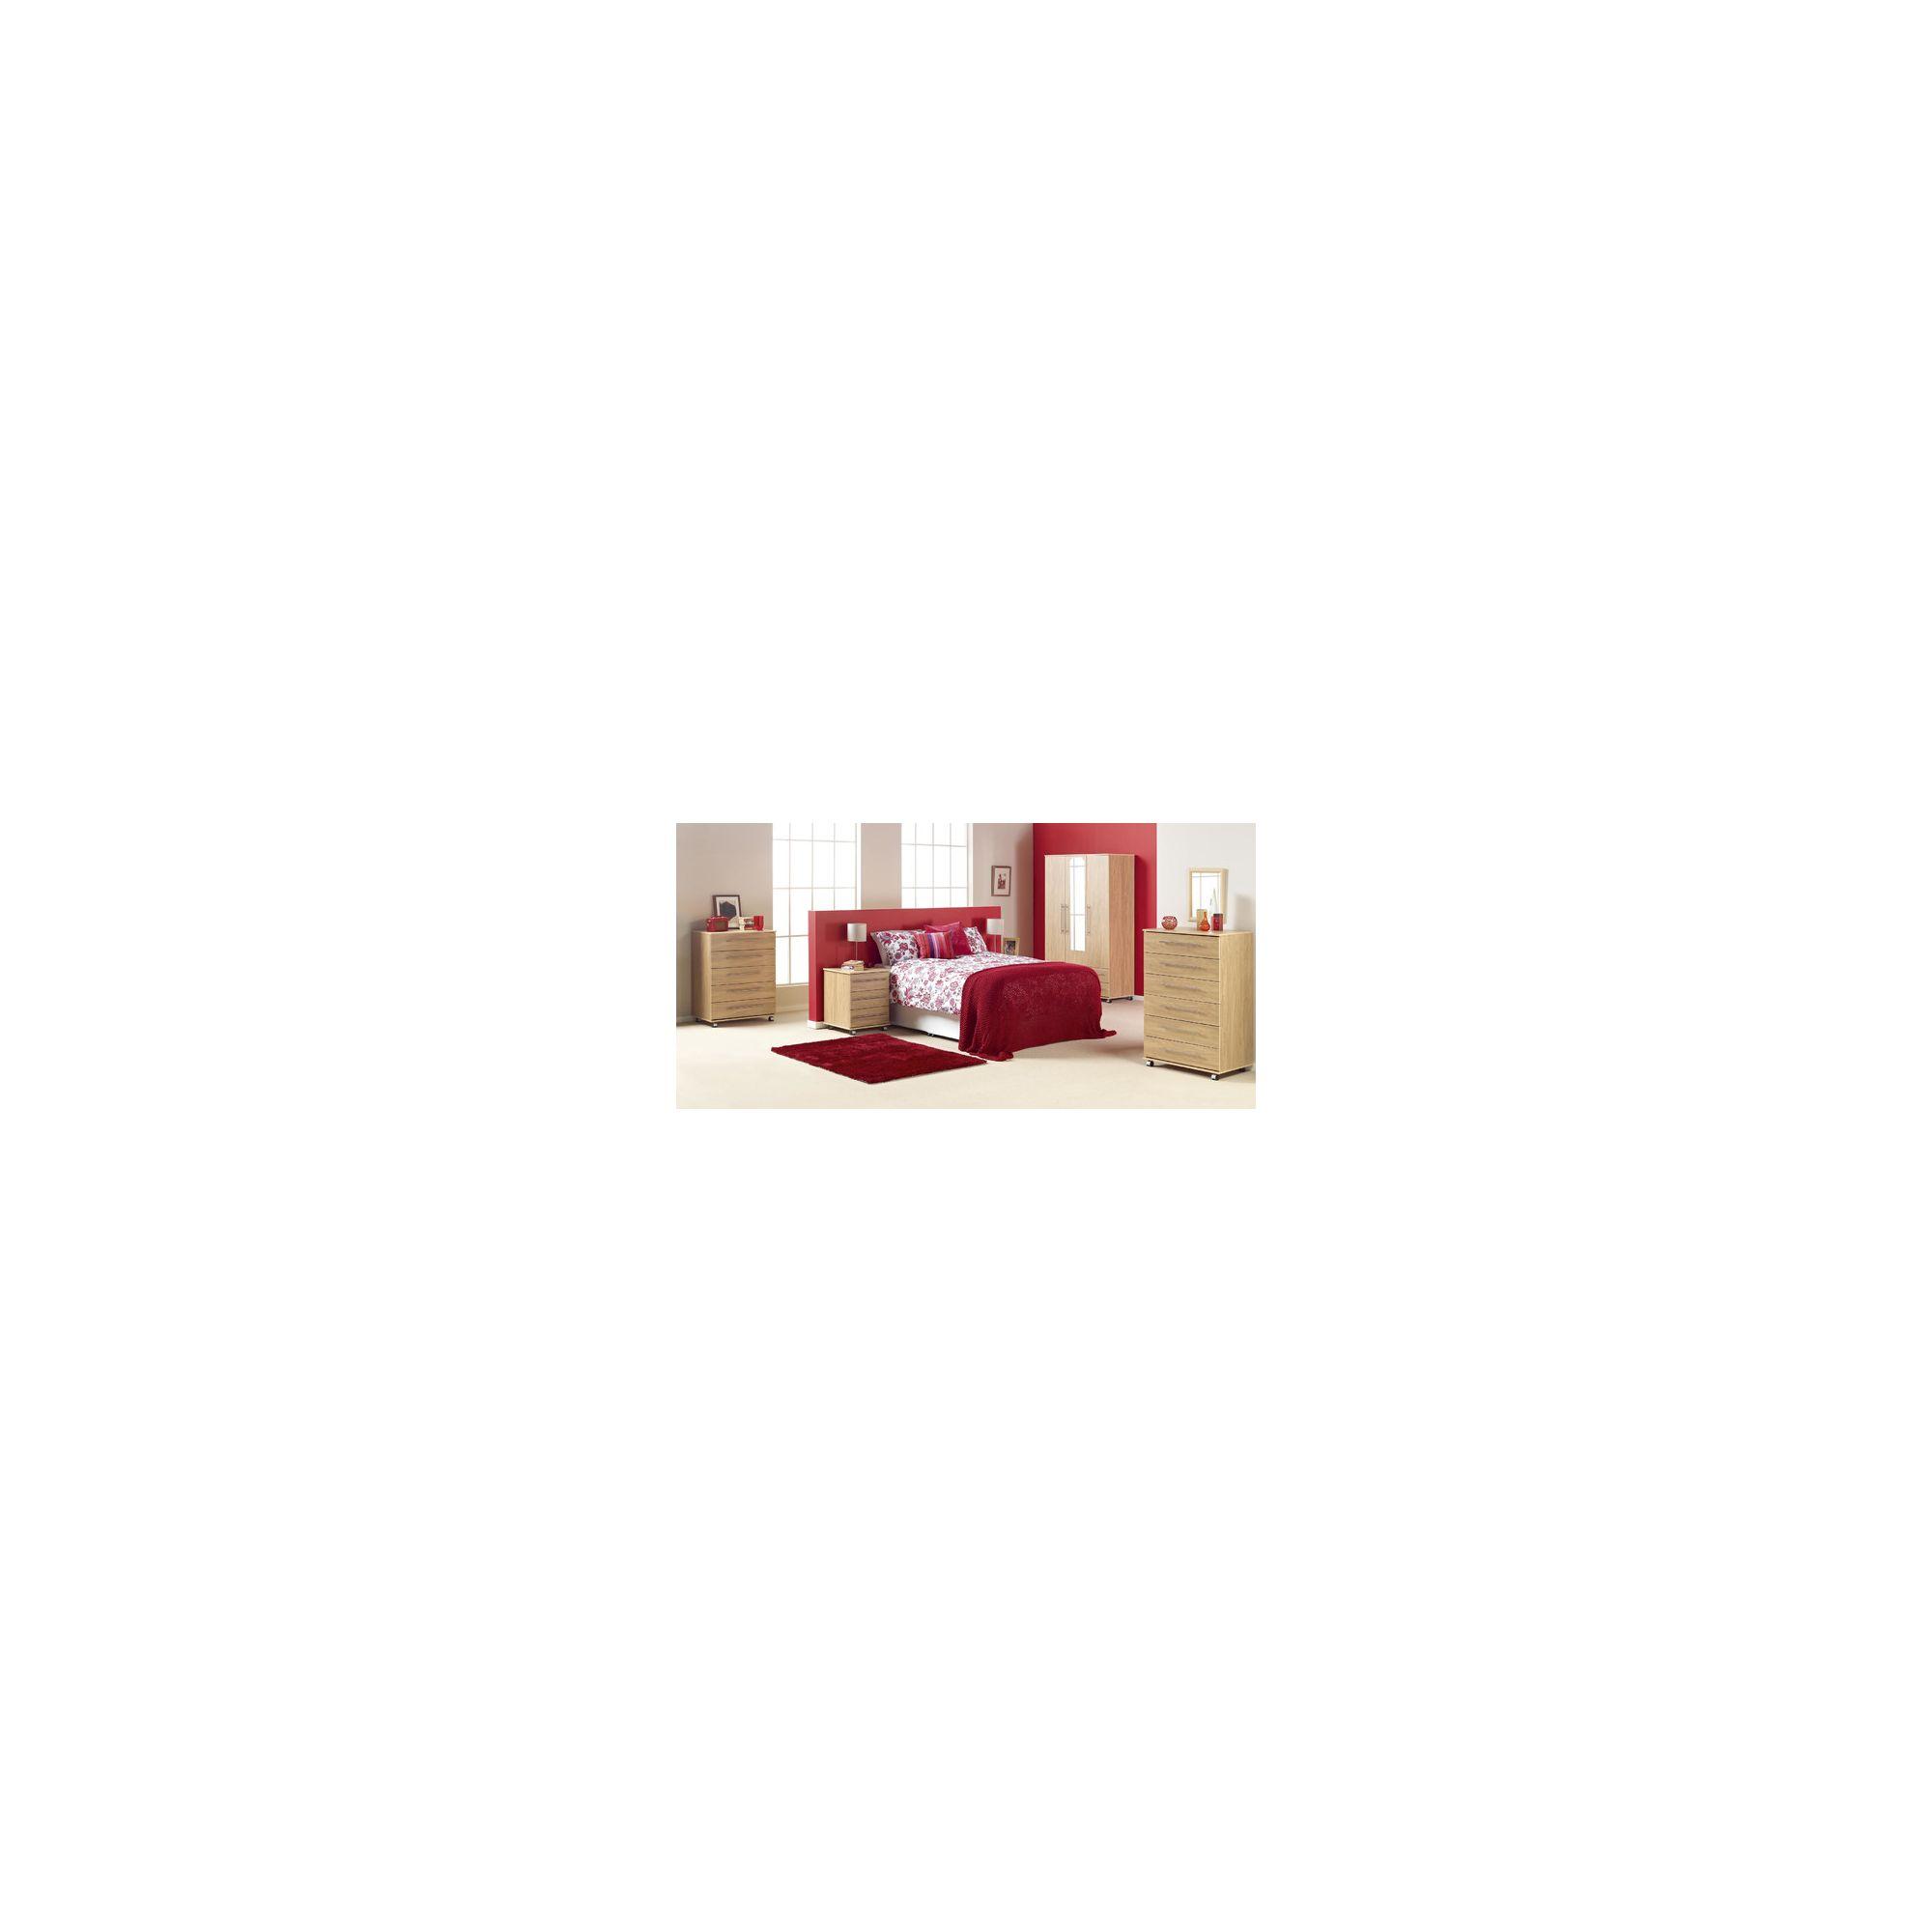 Ideal Furniture Bobby 4 Door Wardrobe - Beech at Tesco Direct